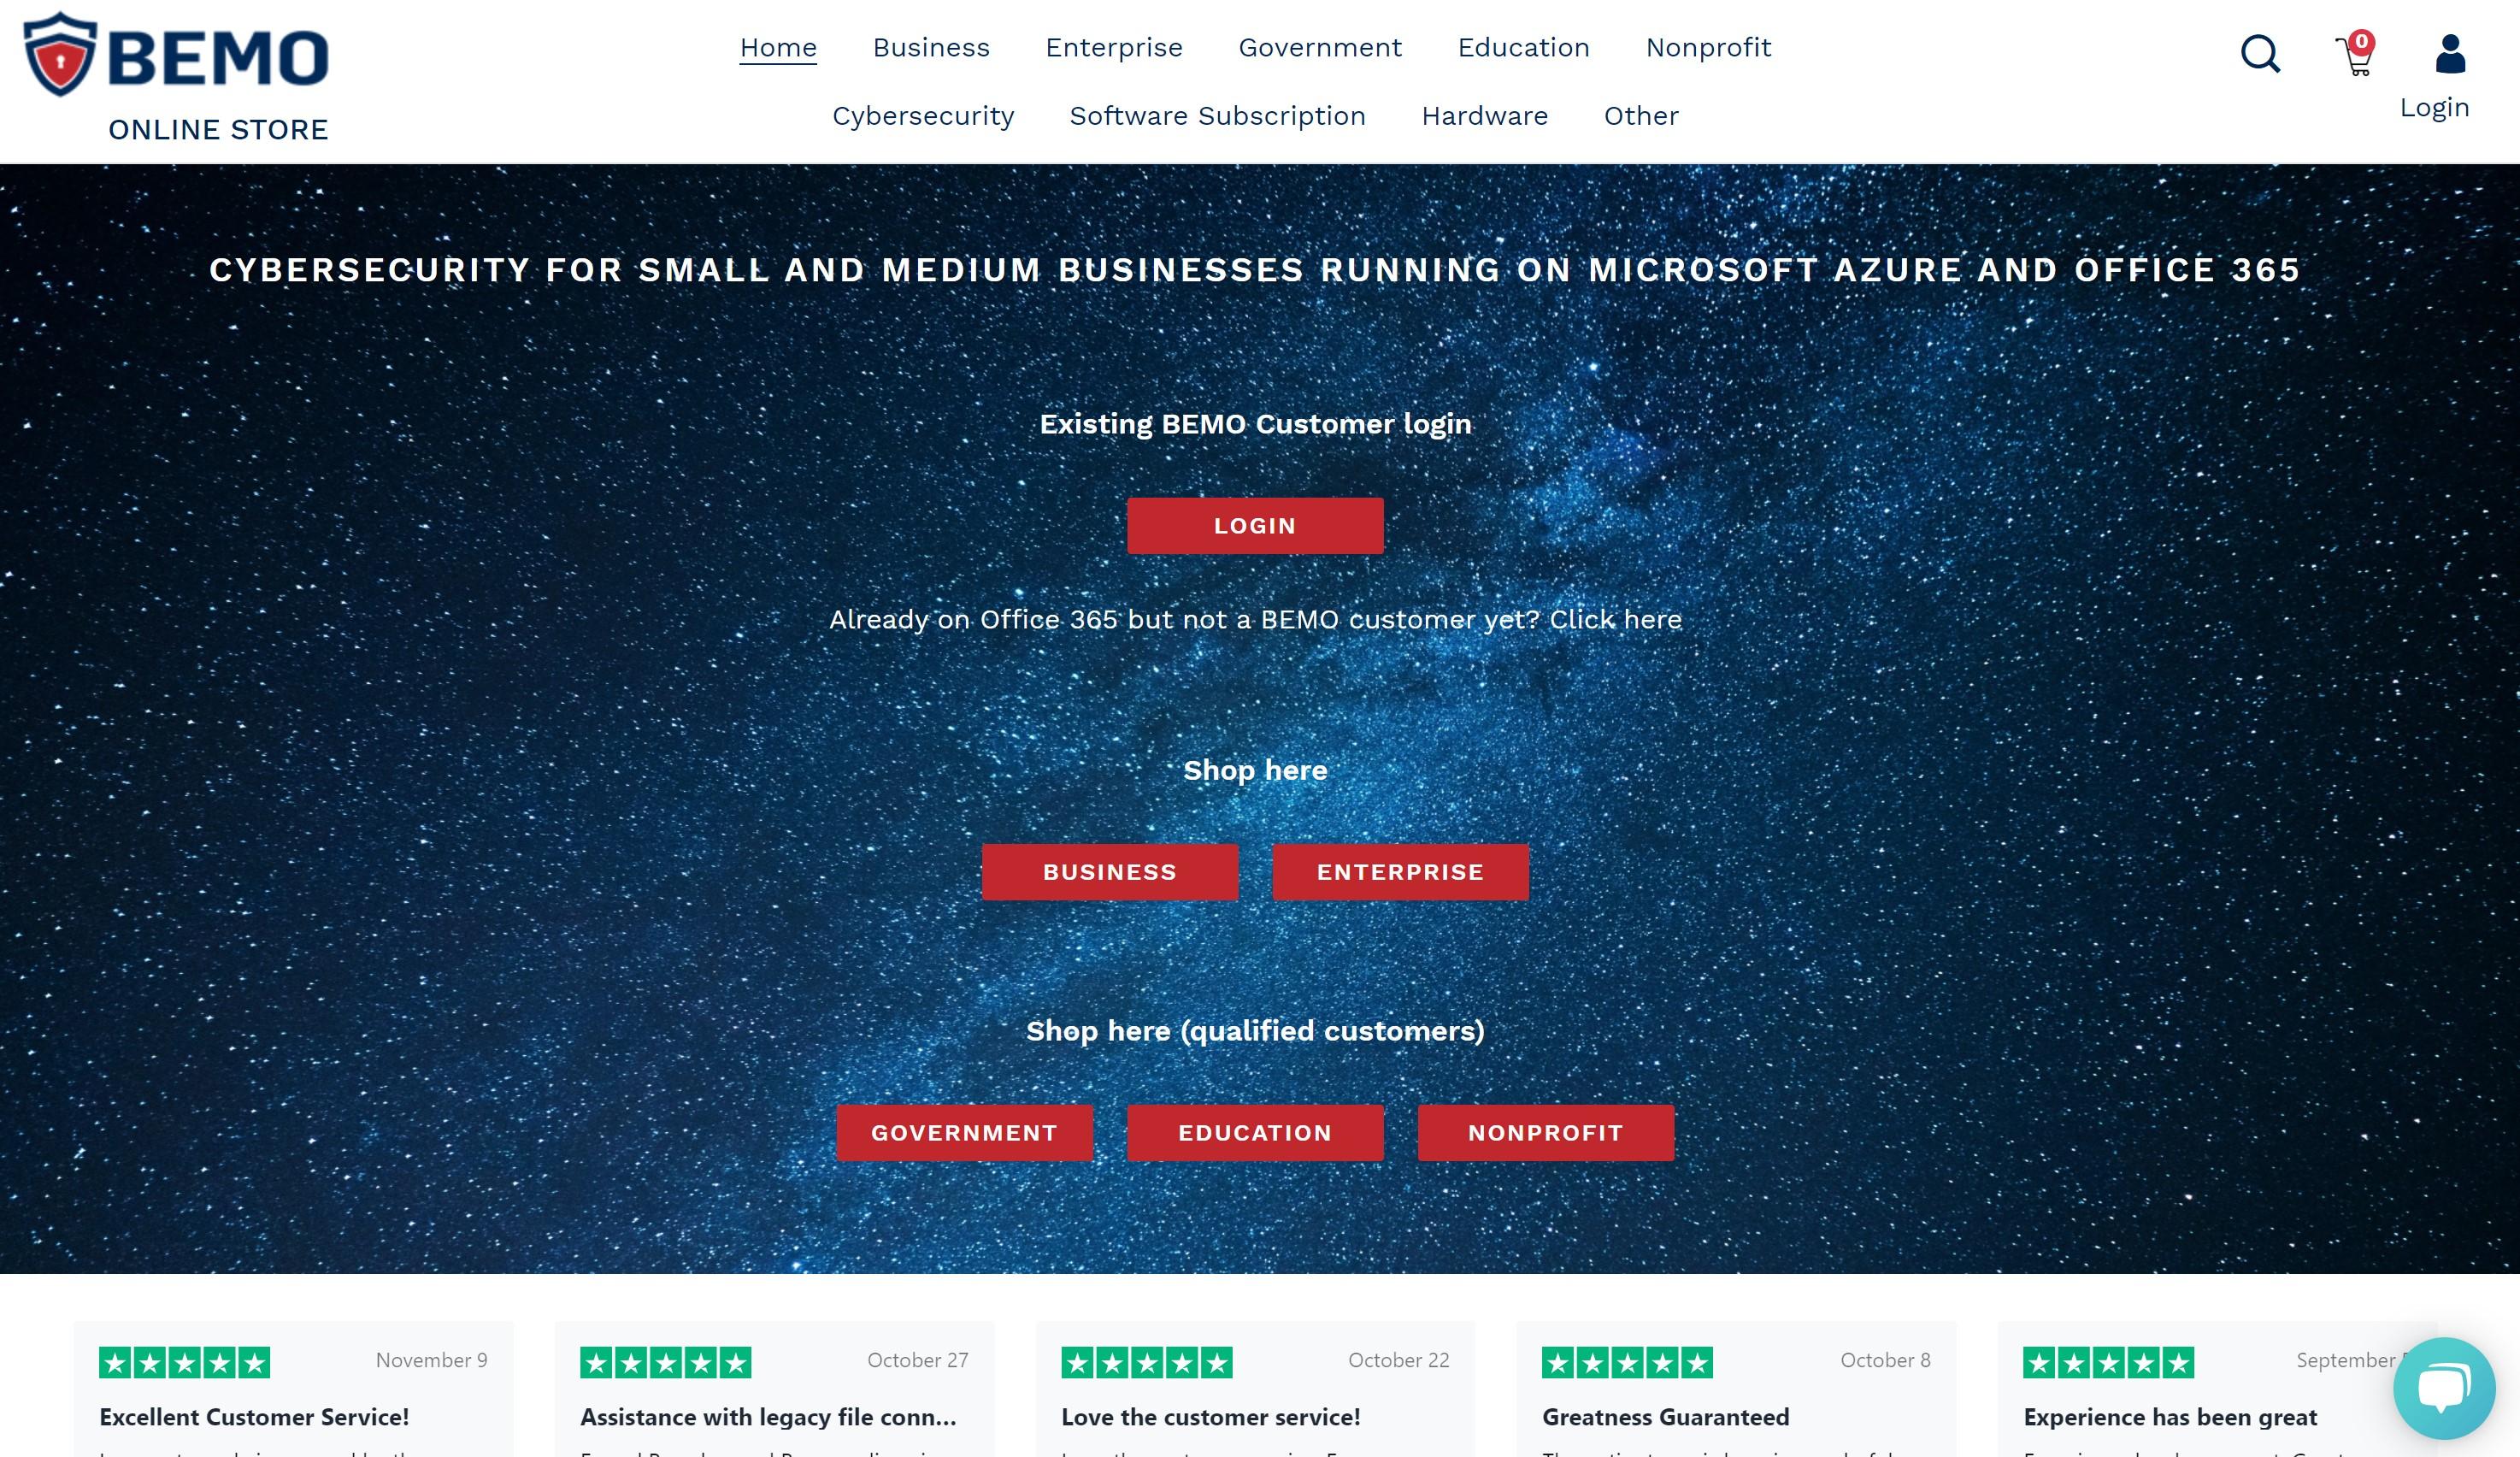 BEMO Online Store